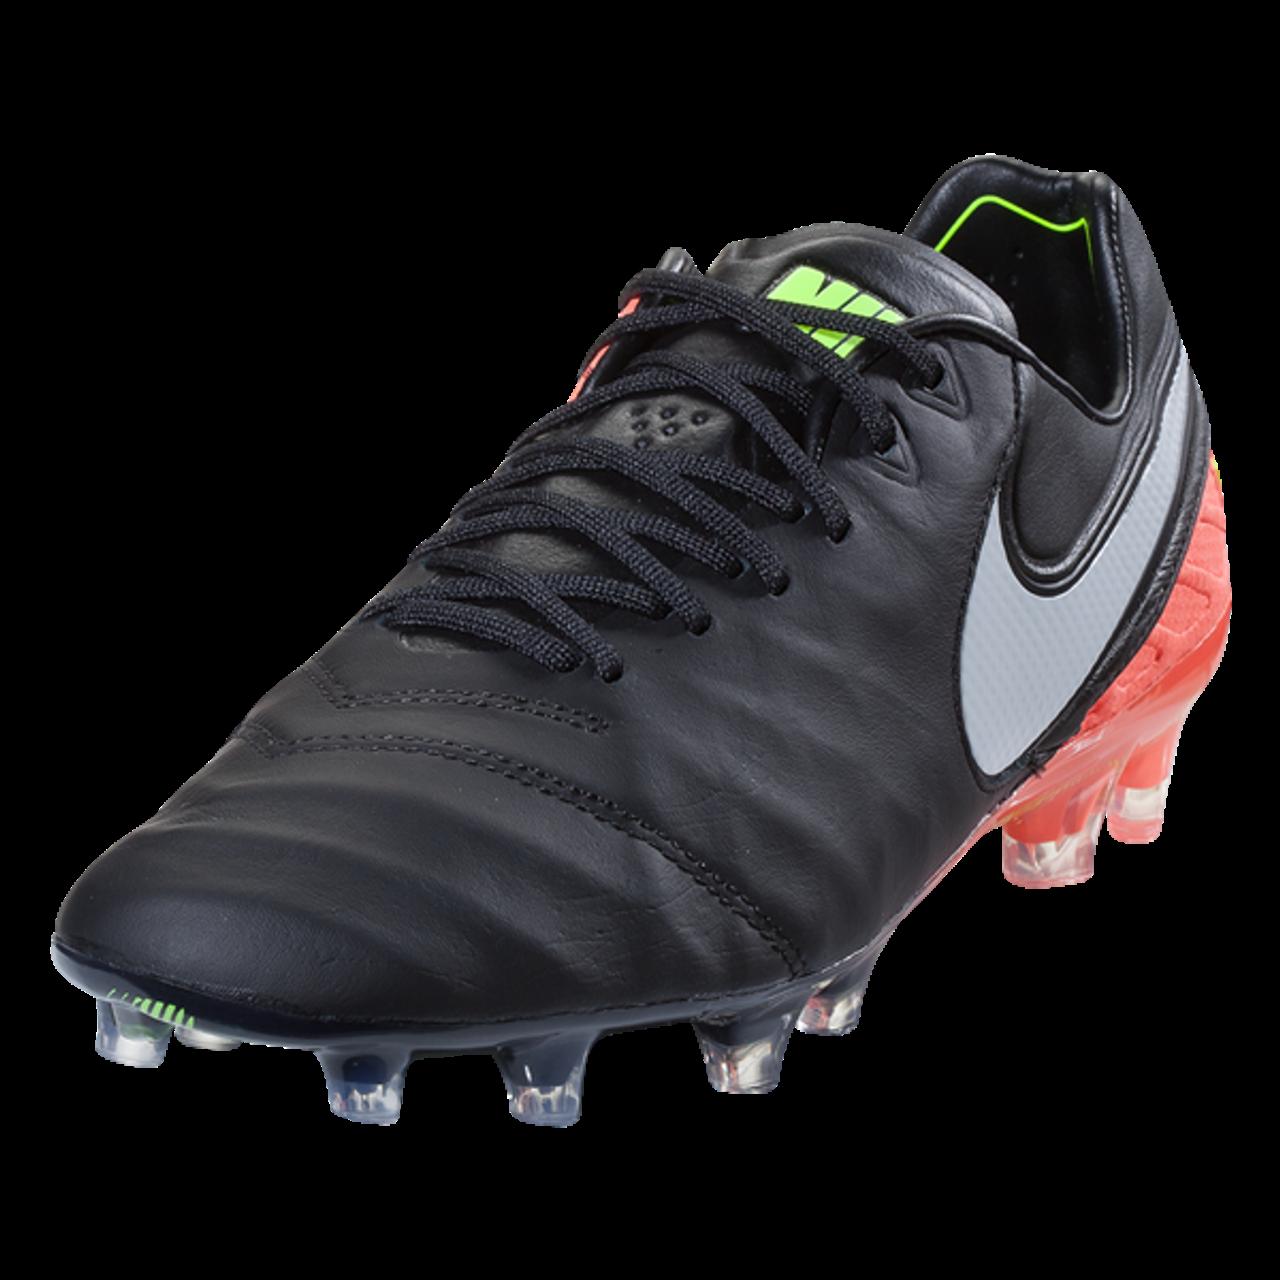 13bc83827 Nike Tiempo Legend VI FG - Black/White/Hyper Orange/Volt RC (031419) - ohp  soccer